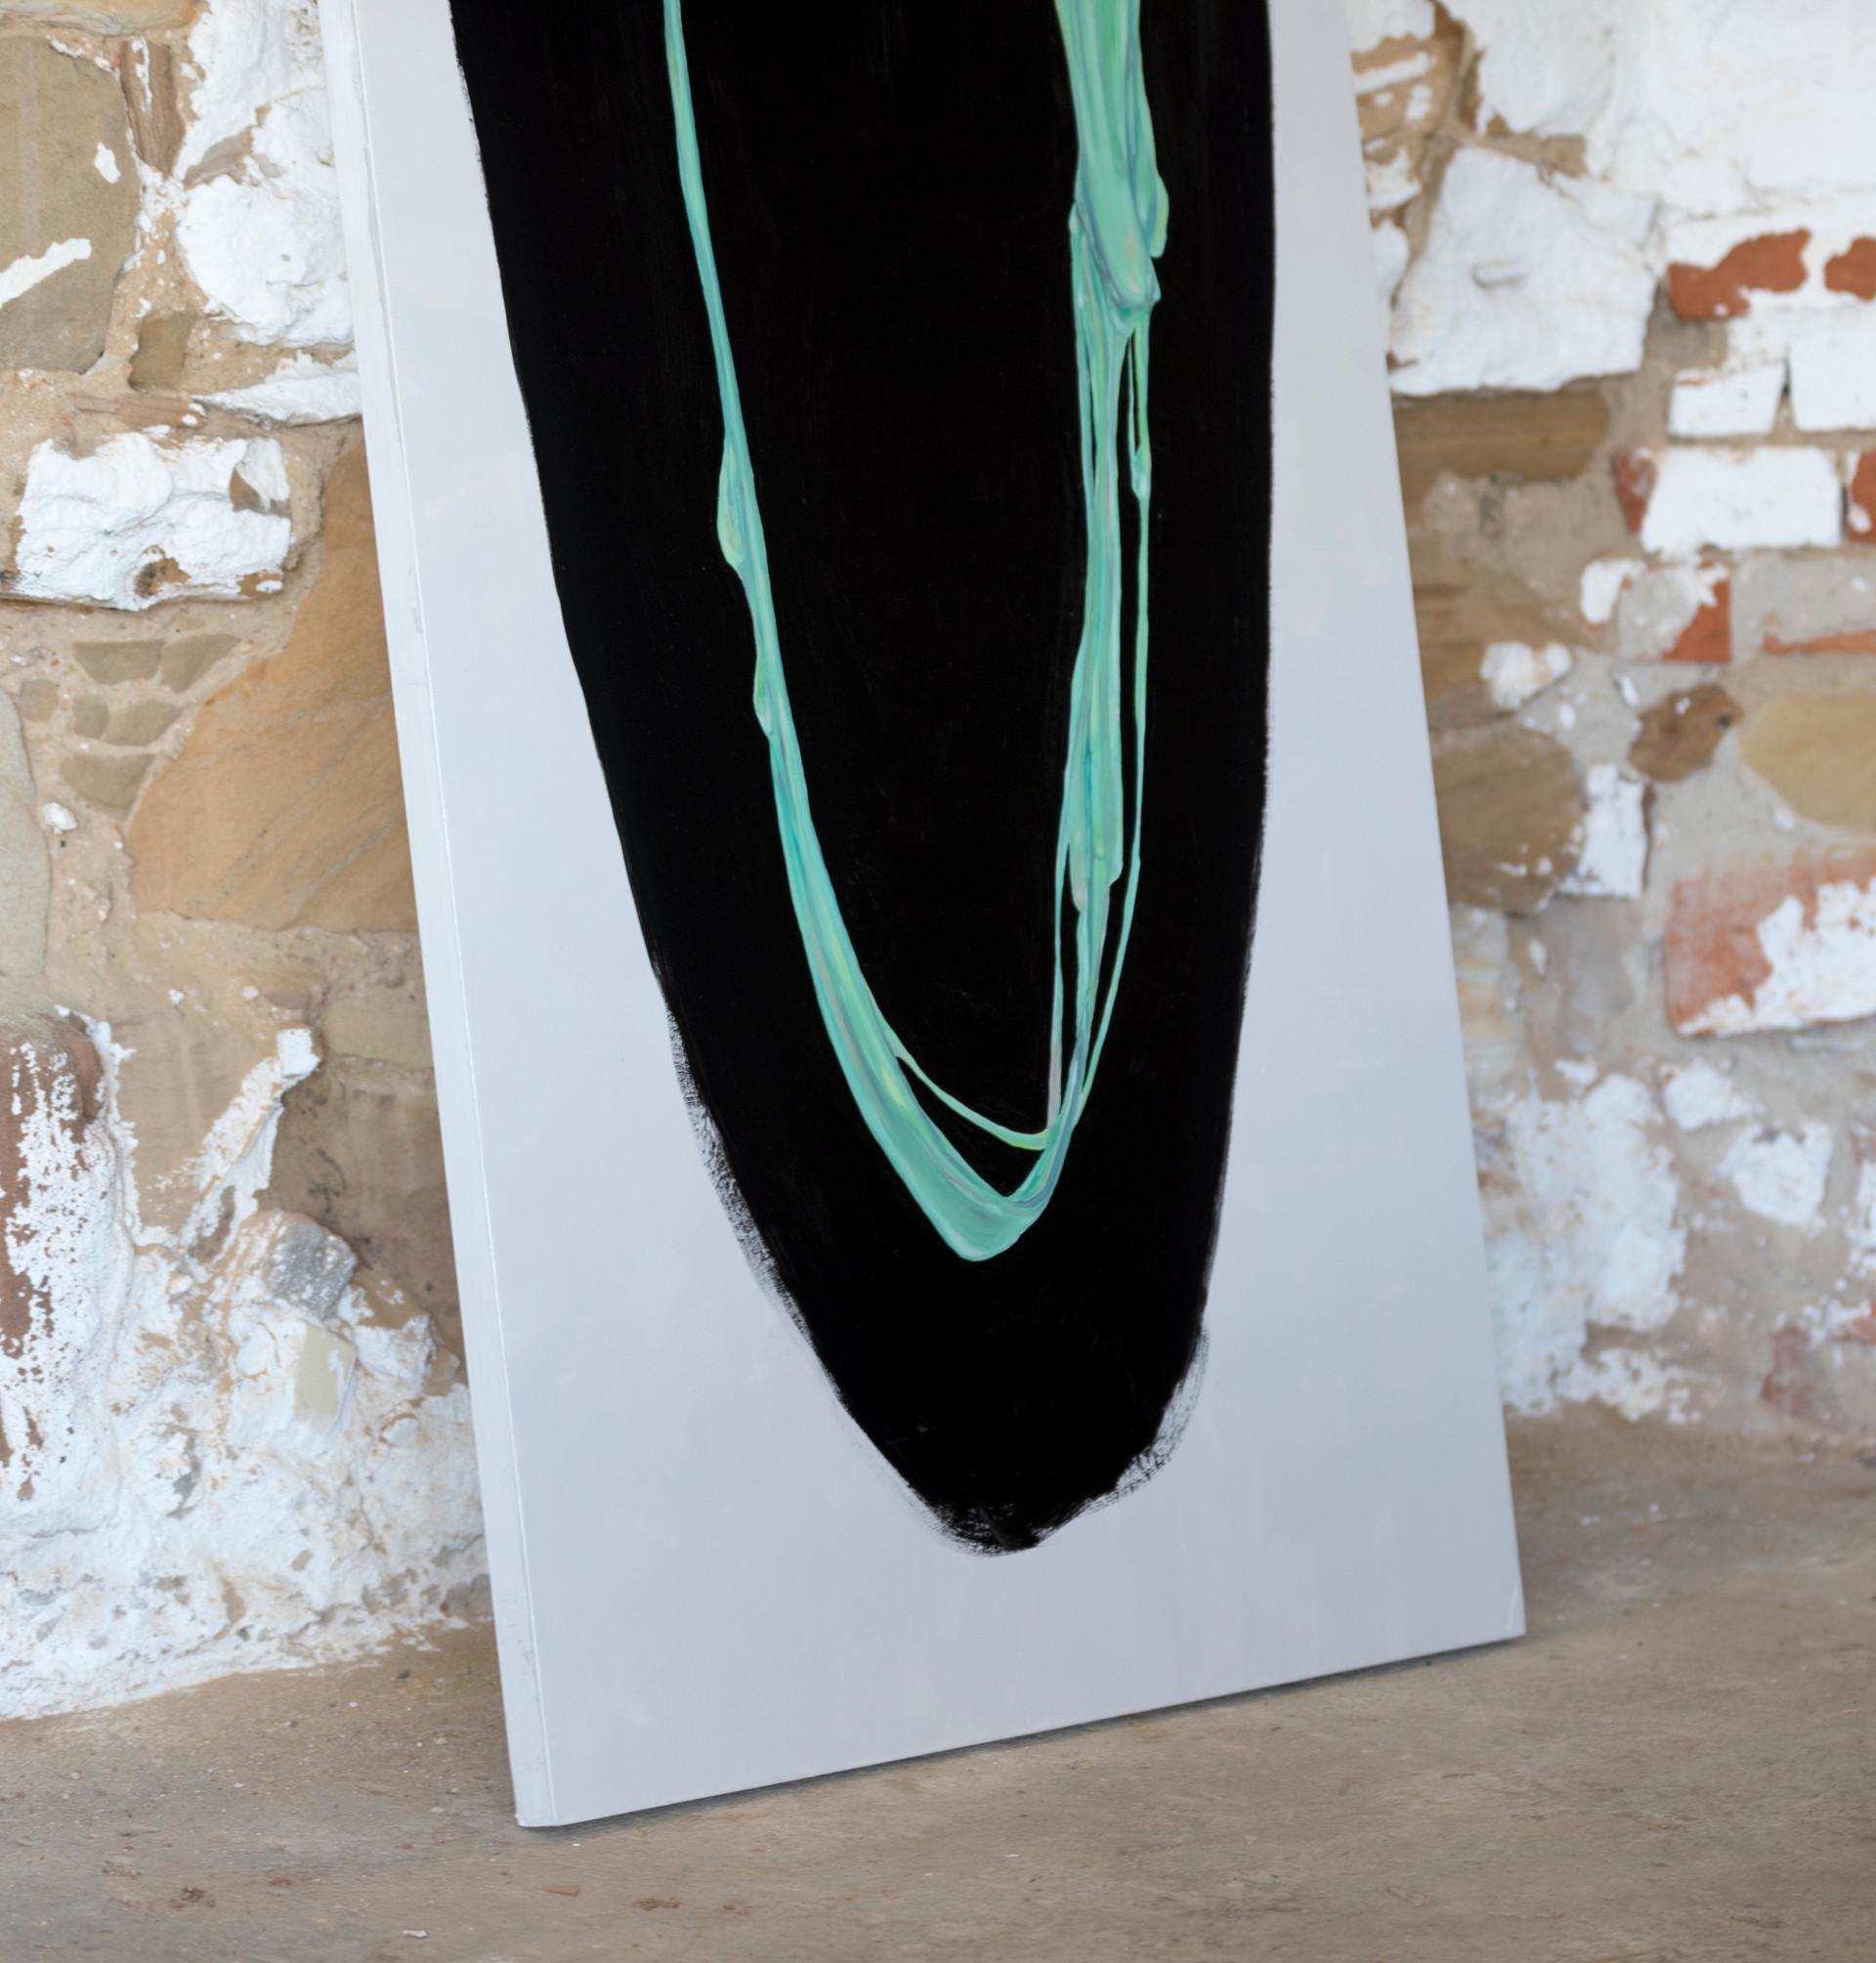 Gum Face (detail), 2017, oil on board, 205 x 72 cm